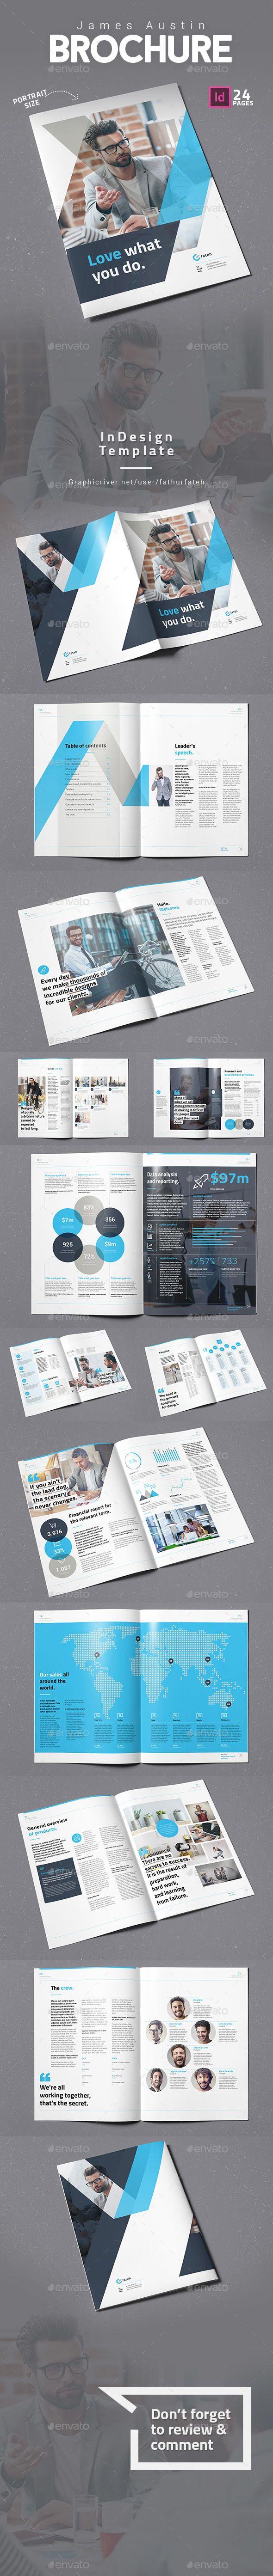 James Austin Brochure Portrait — InDesign Template #flyer #solution ...